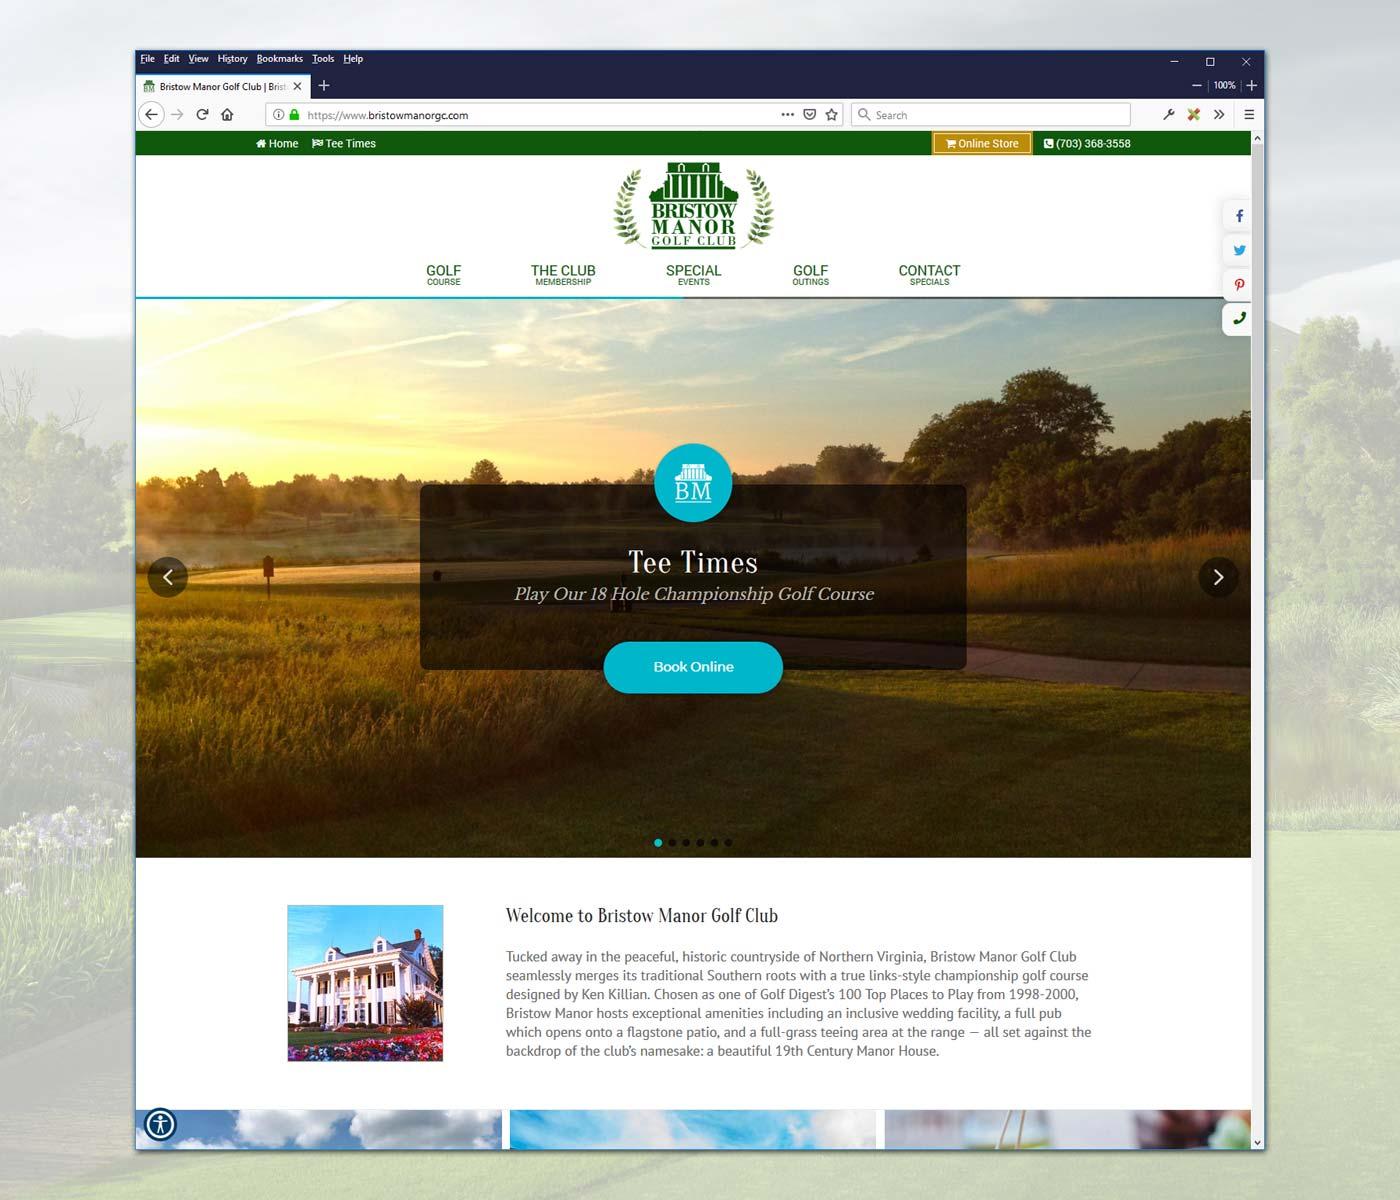 Golf Course Website Design by RWM - Website